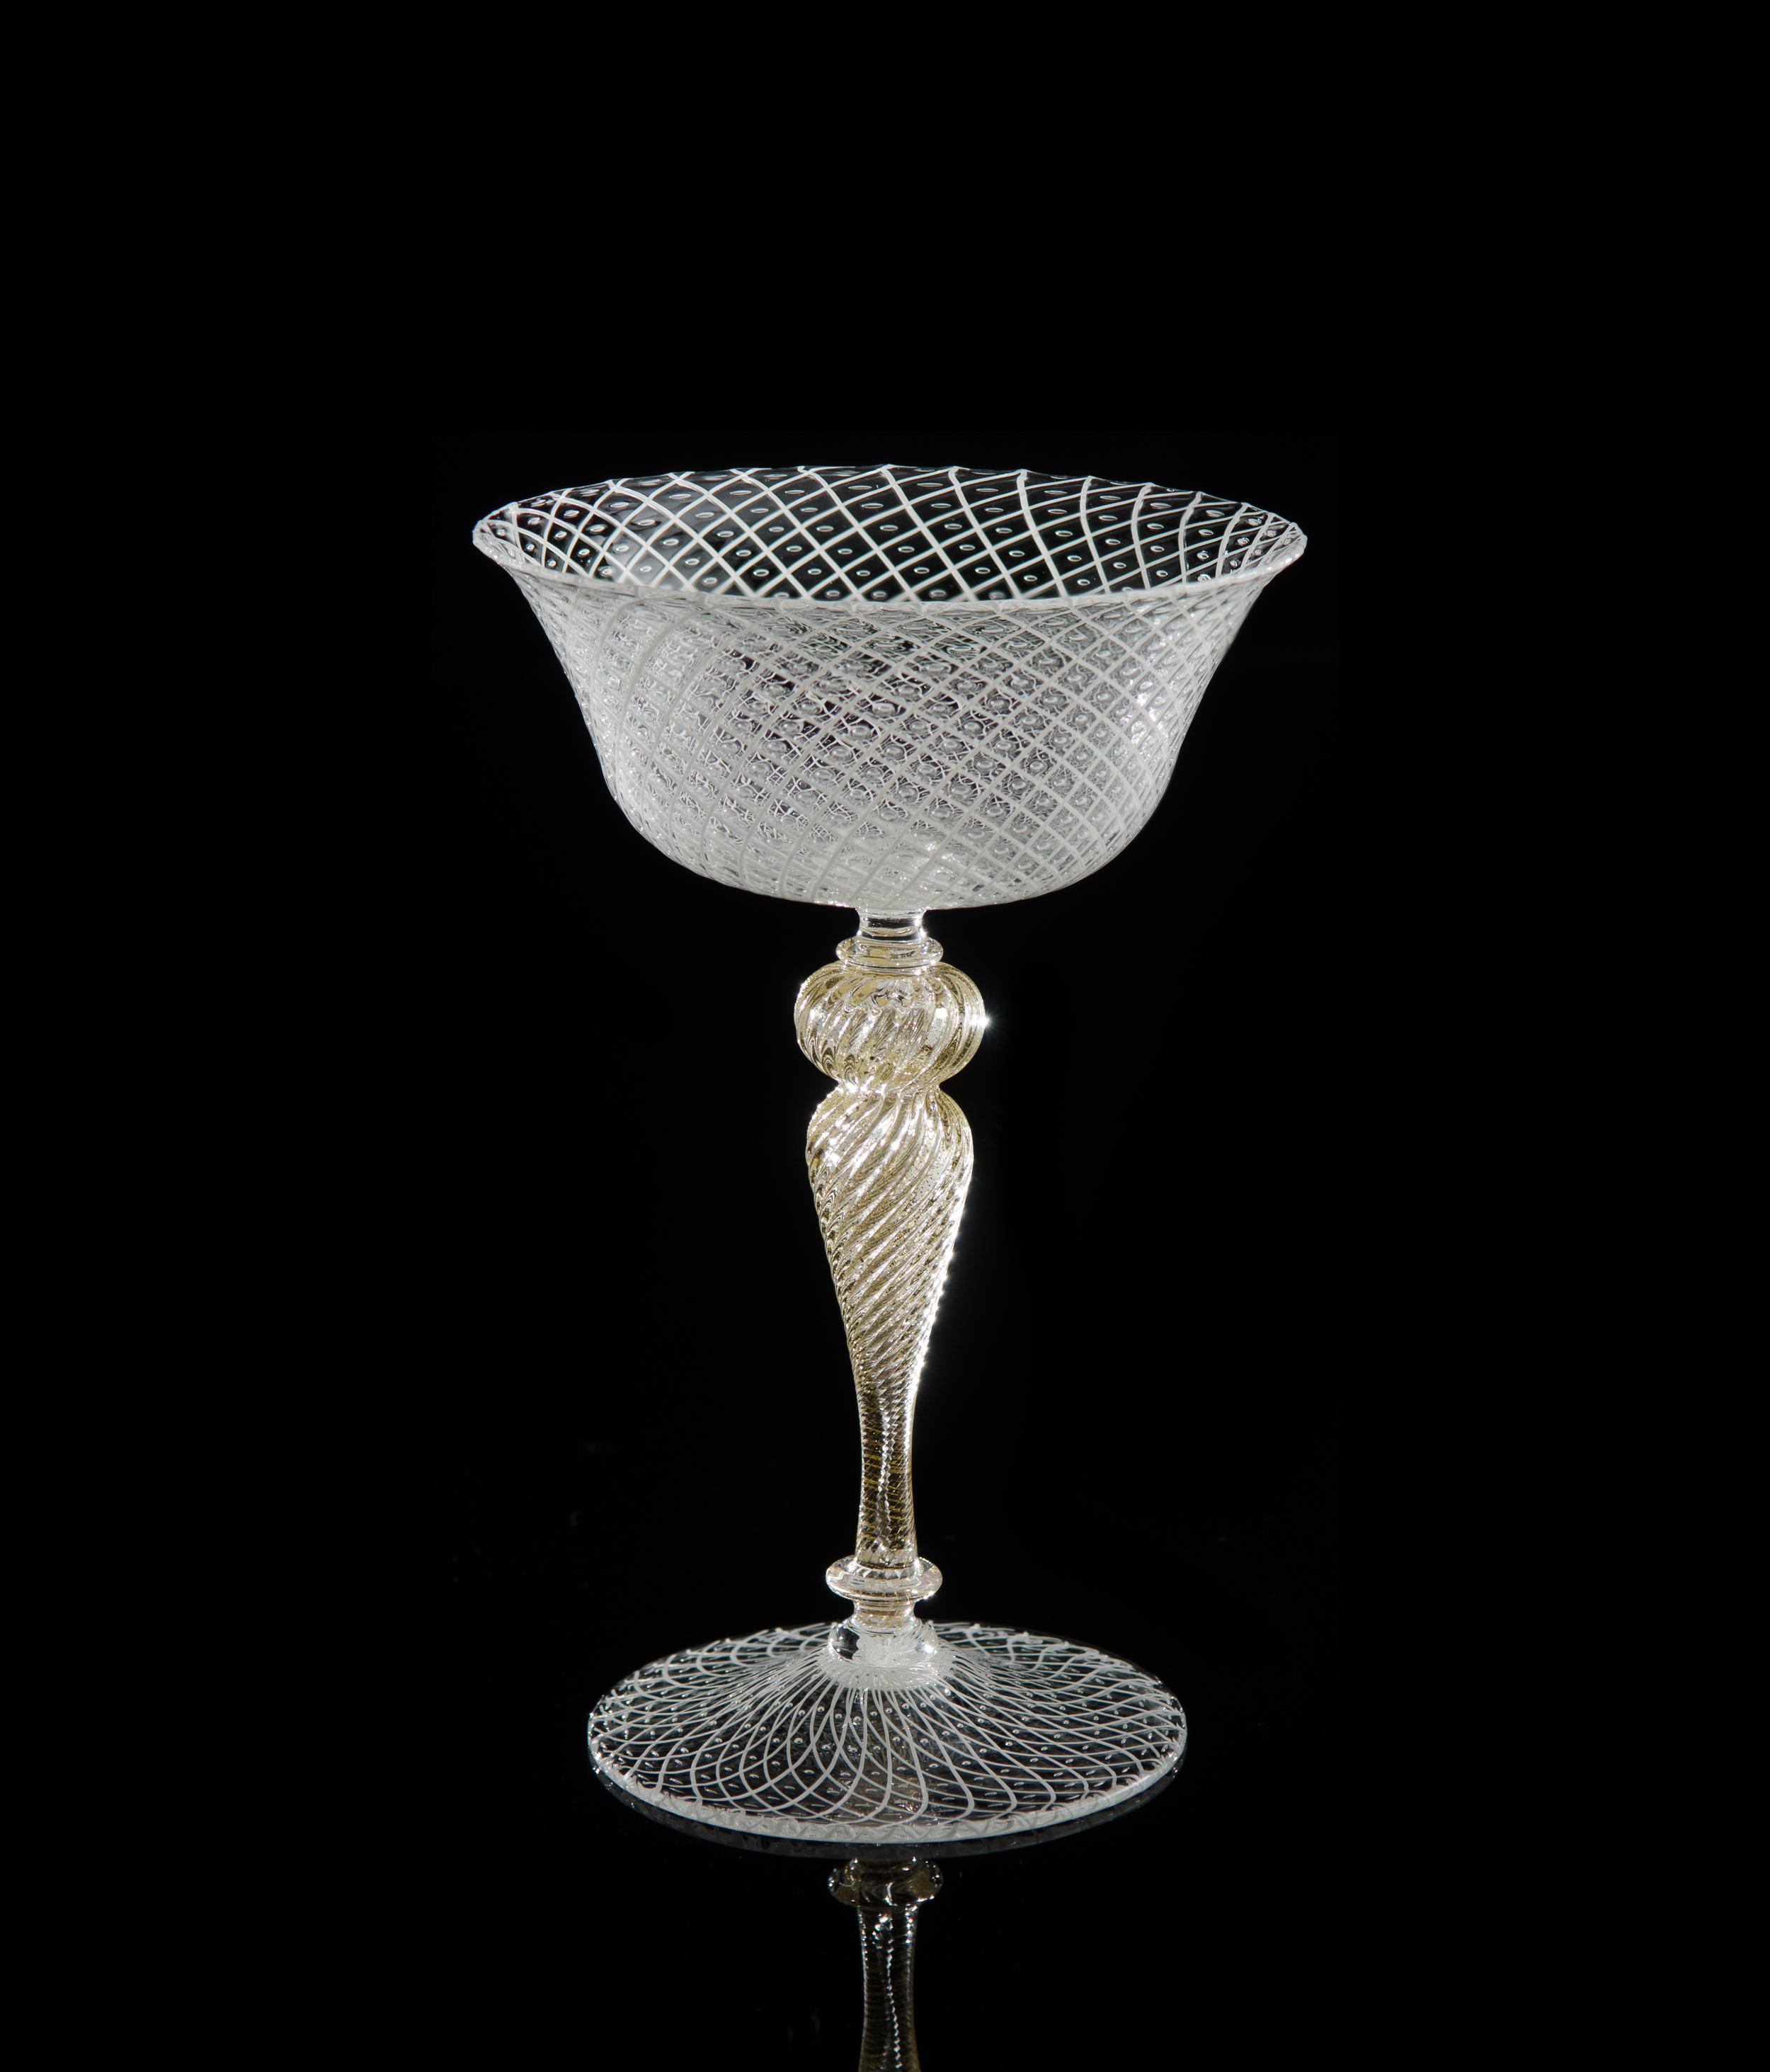 Lino Tagliapietra, Goblet (1991-1994, glass, 6 5/8 x 4 1/2 x 4 1/2 inches), LT.18